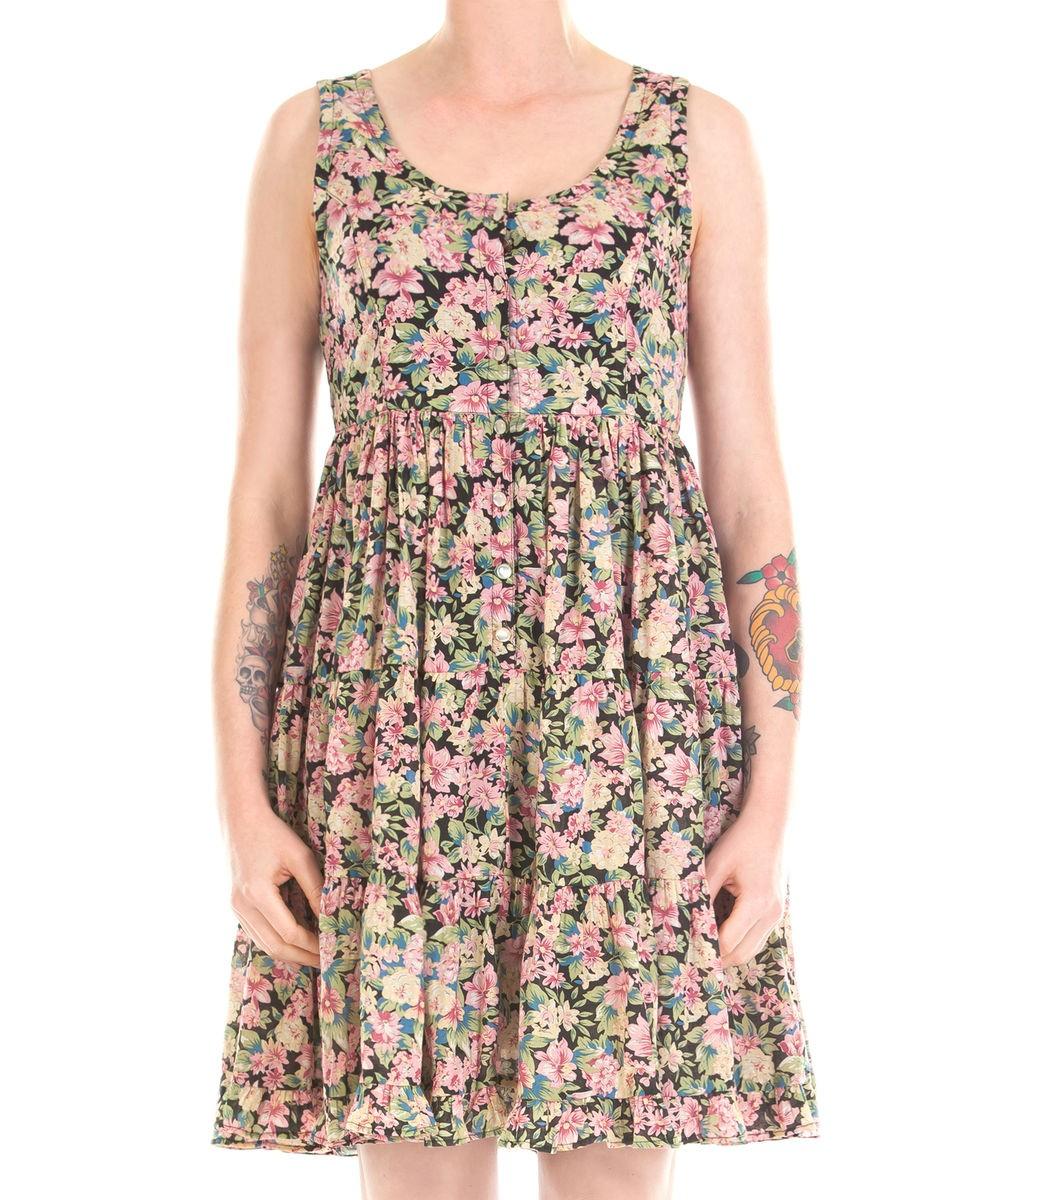 Rita Floral Swing Dress